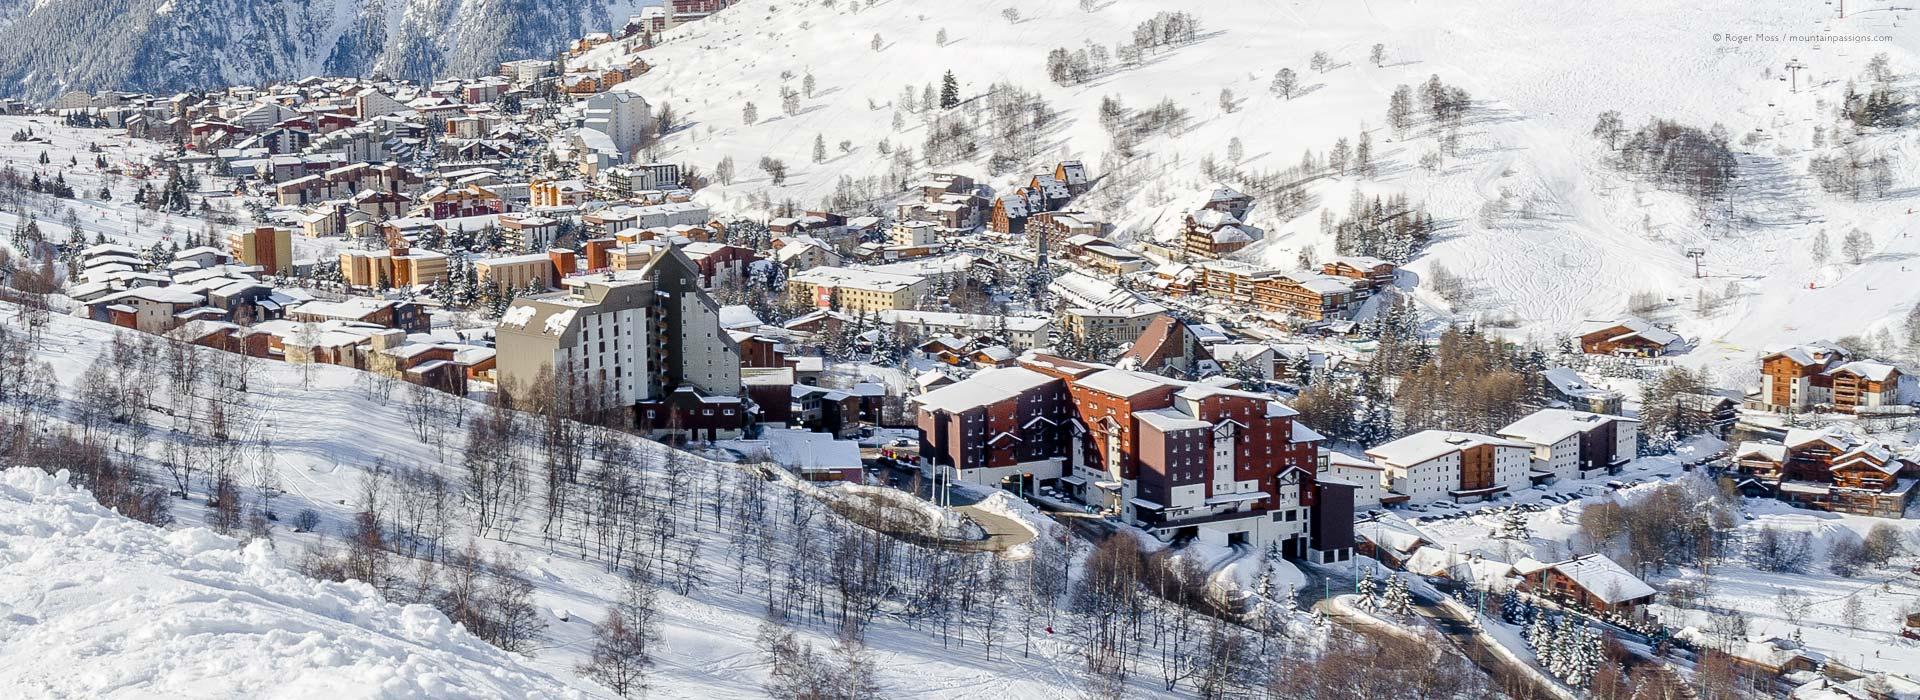 View of Les 2 Alpes ski village, showing Club Med